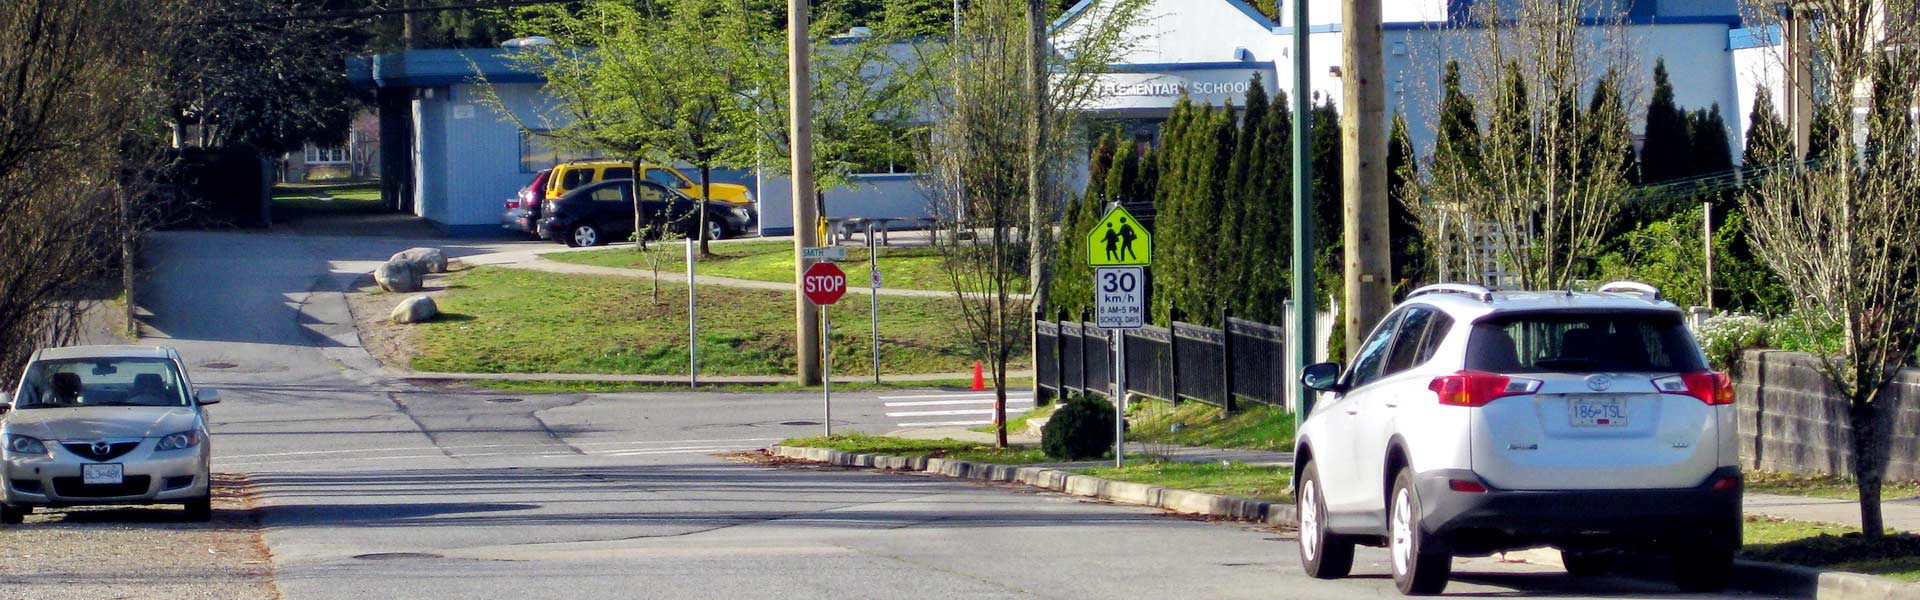 Burquitlam Lougheed Neighbourhood Greenways